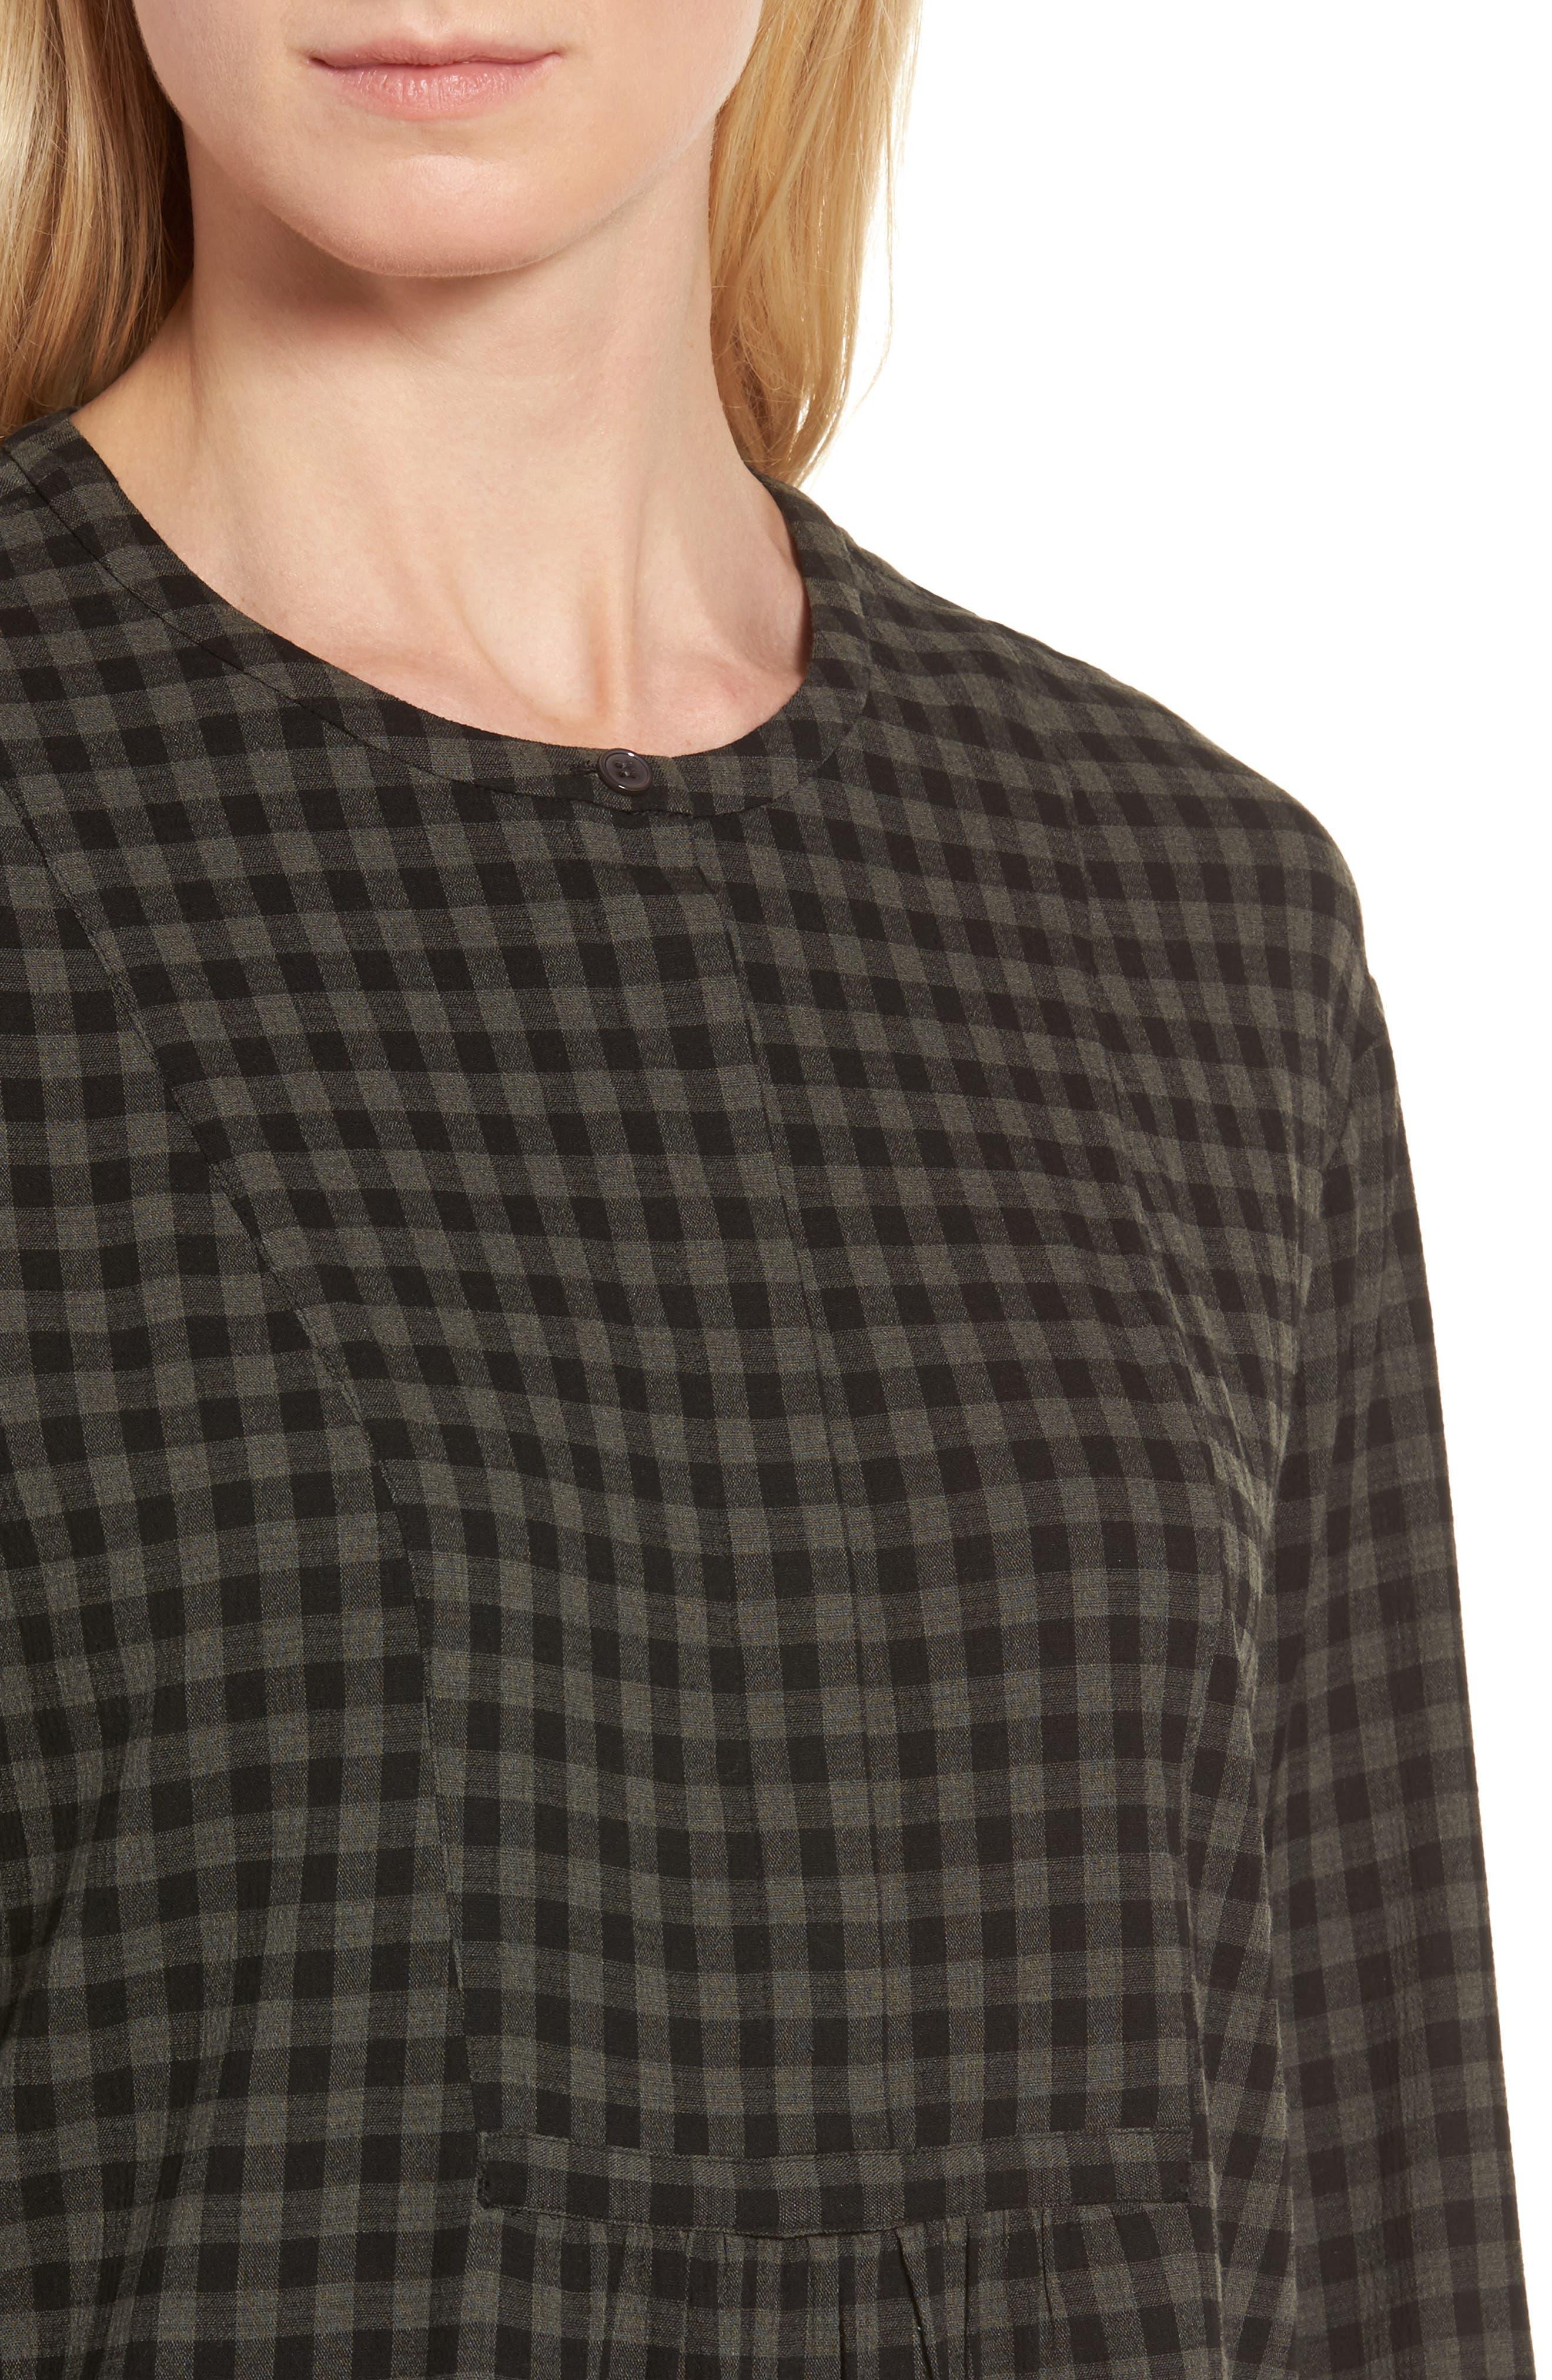 Gingham Check Blouse,                             Alternate thumbnail 4, color,                             Olive/ Black Gingham